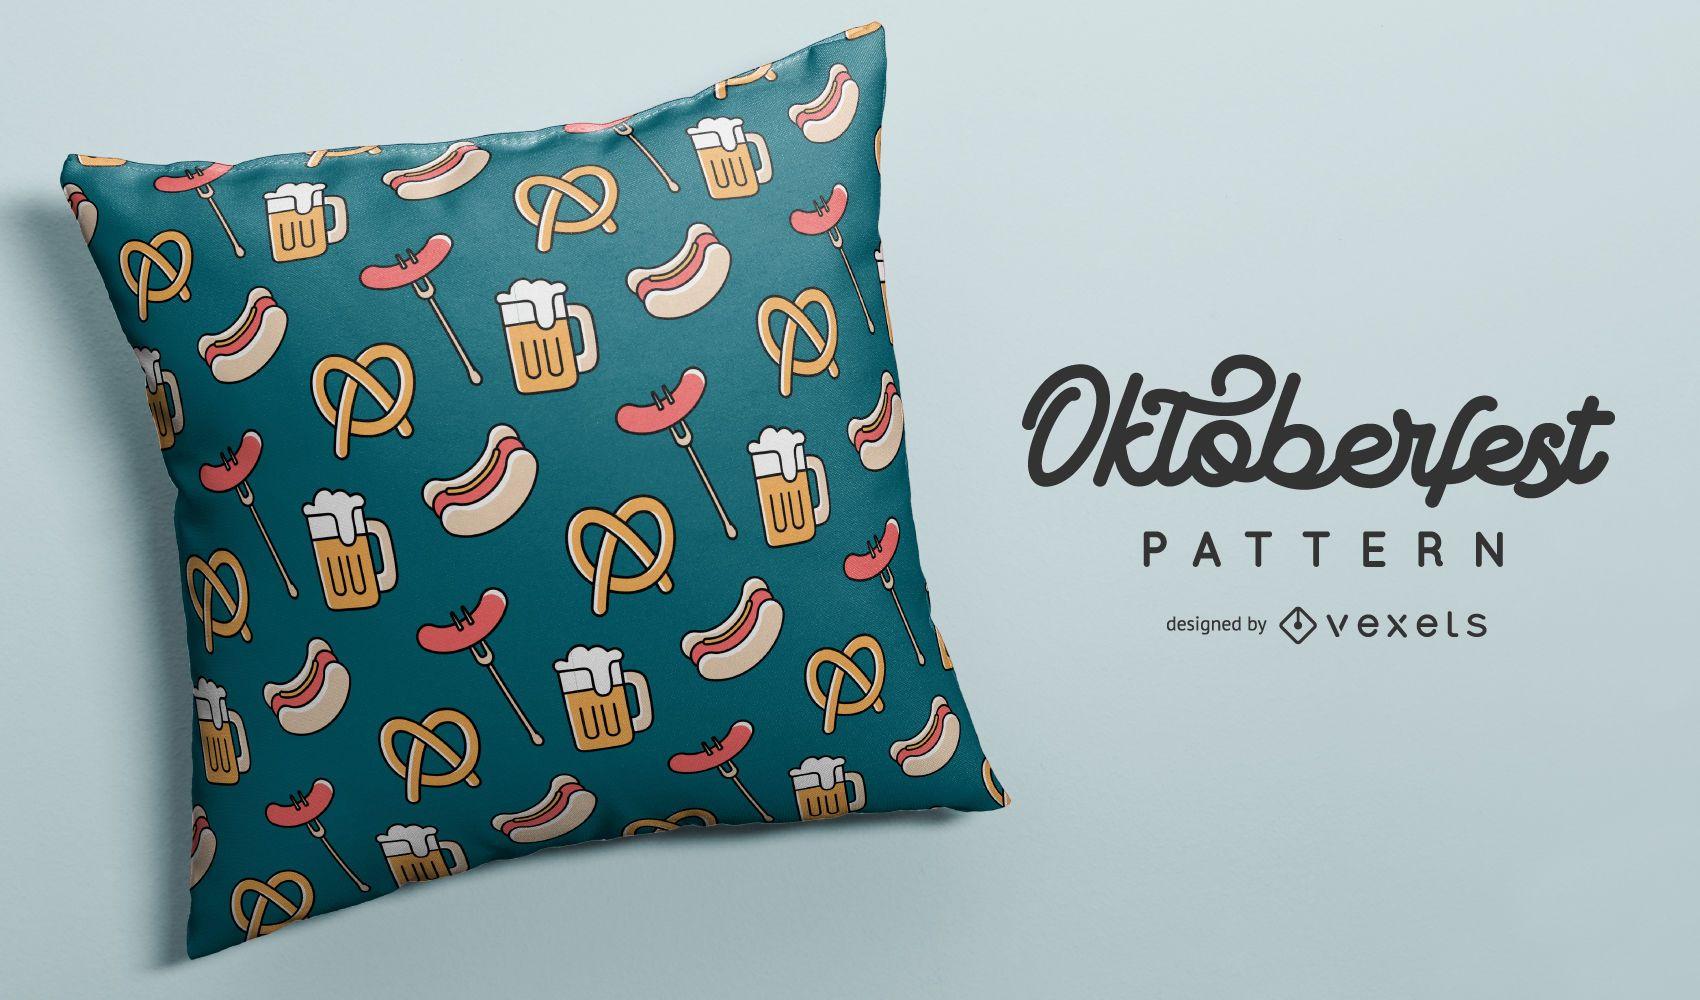 Oktoberfest food and beer pattern design